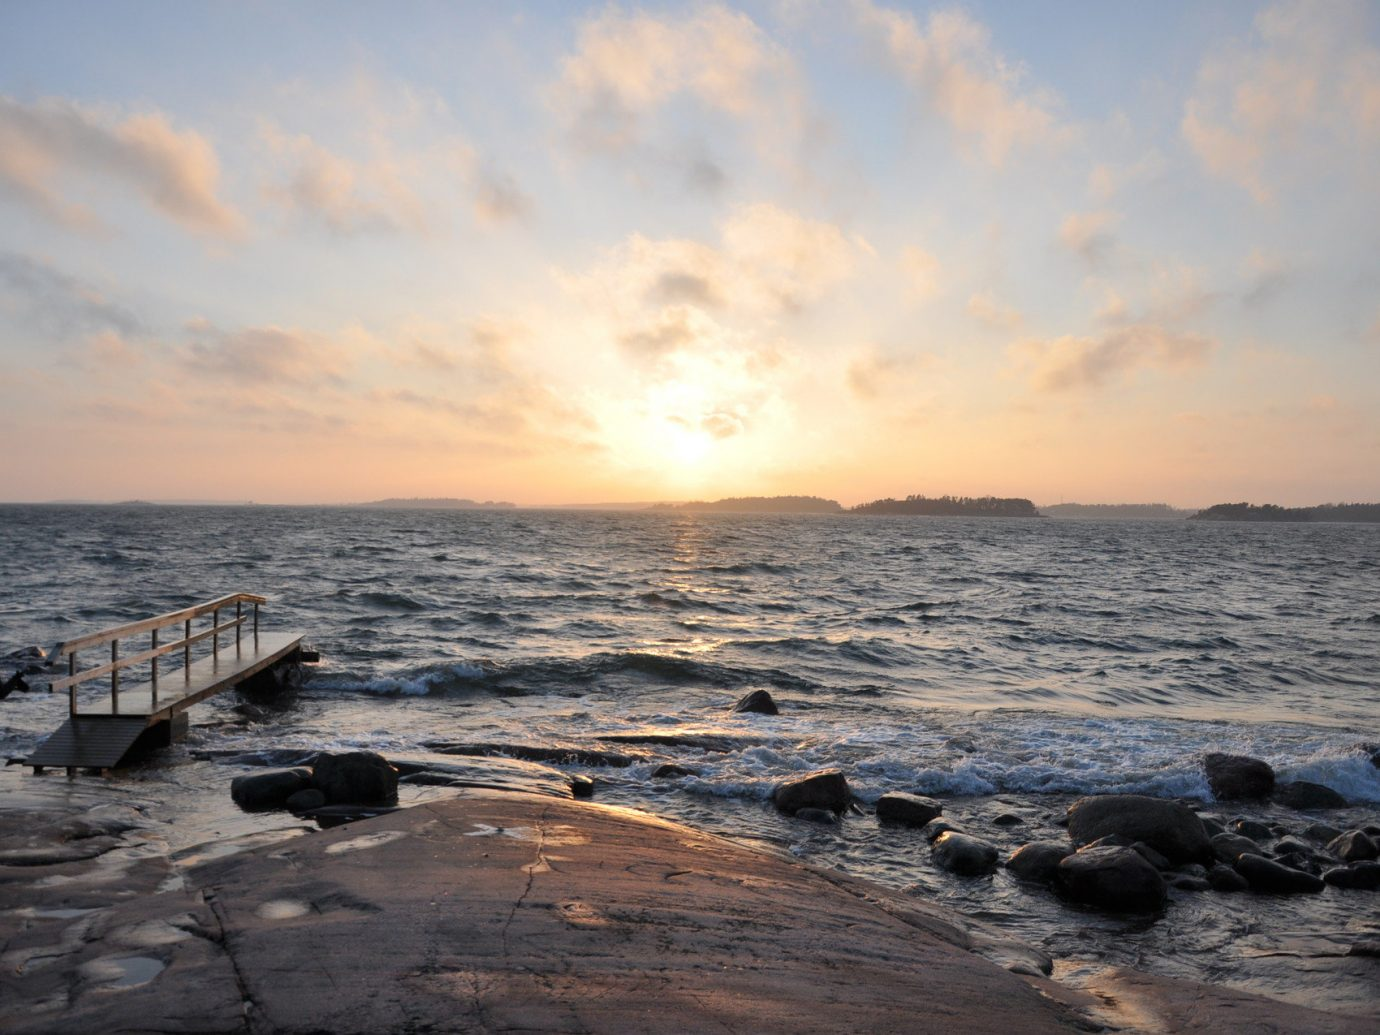 Aland Island, Finland